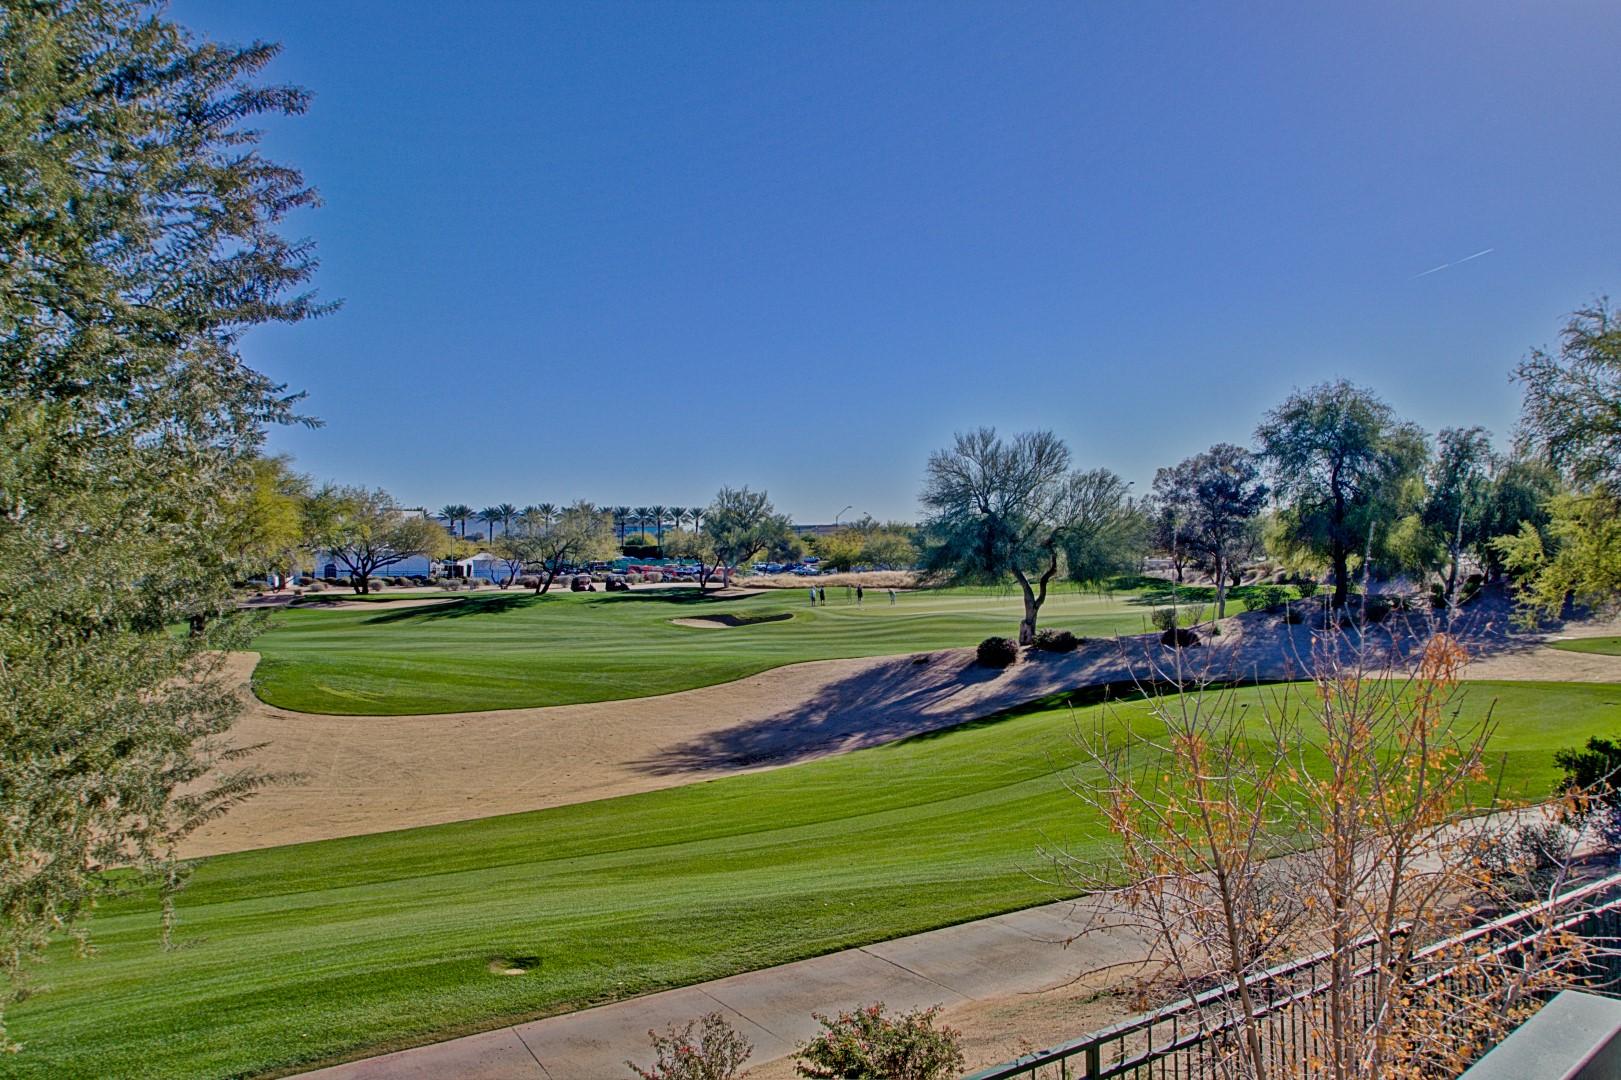 3 Bedroom Golf Course Condo For Sale – 15221 N Clubgate DR 2083 Scottsdale, AZ